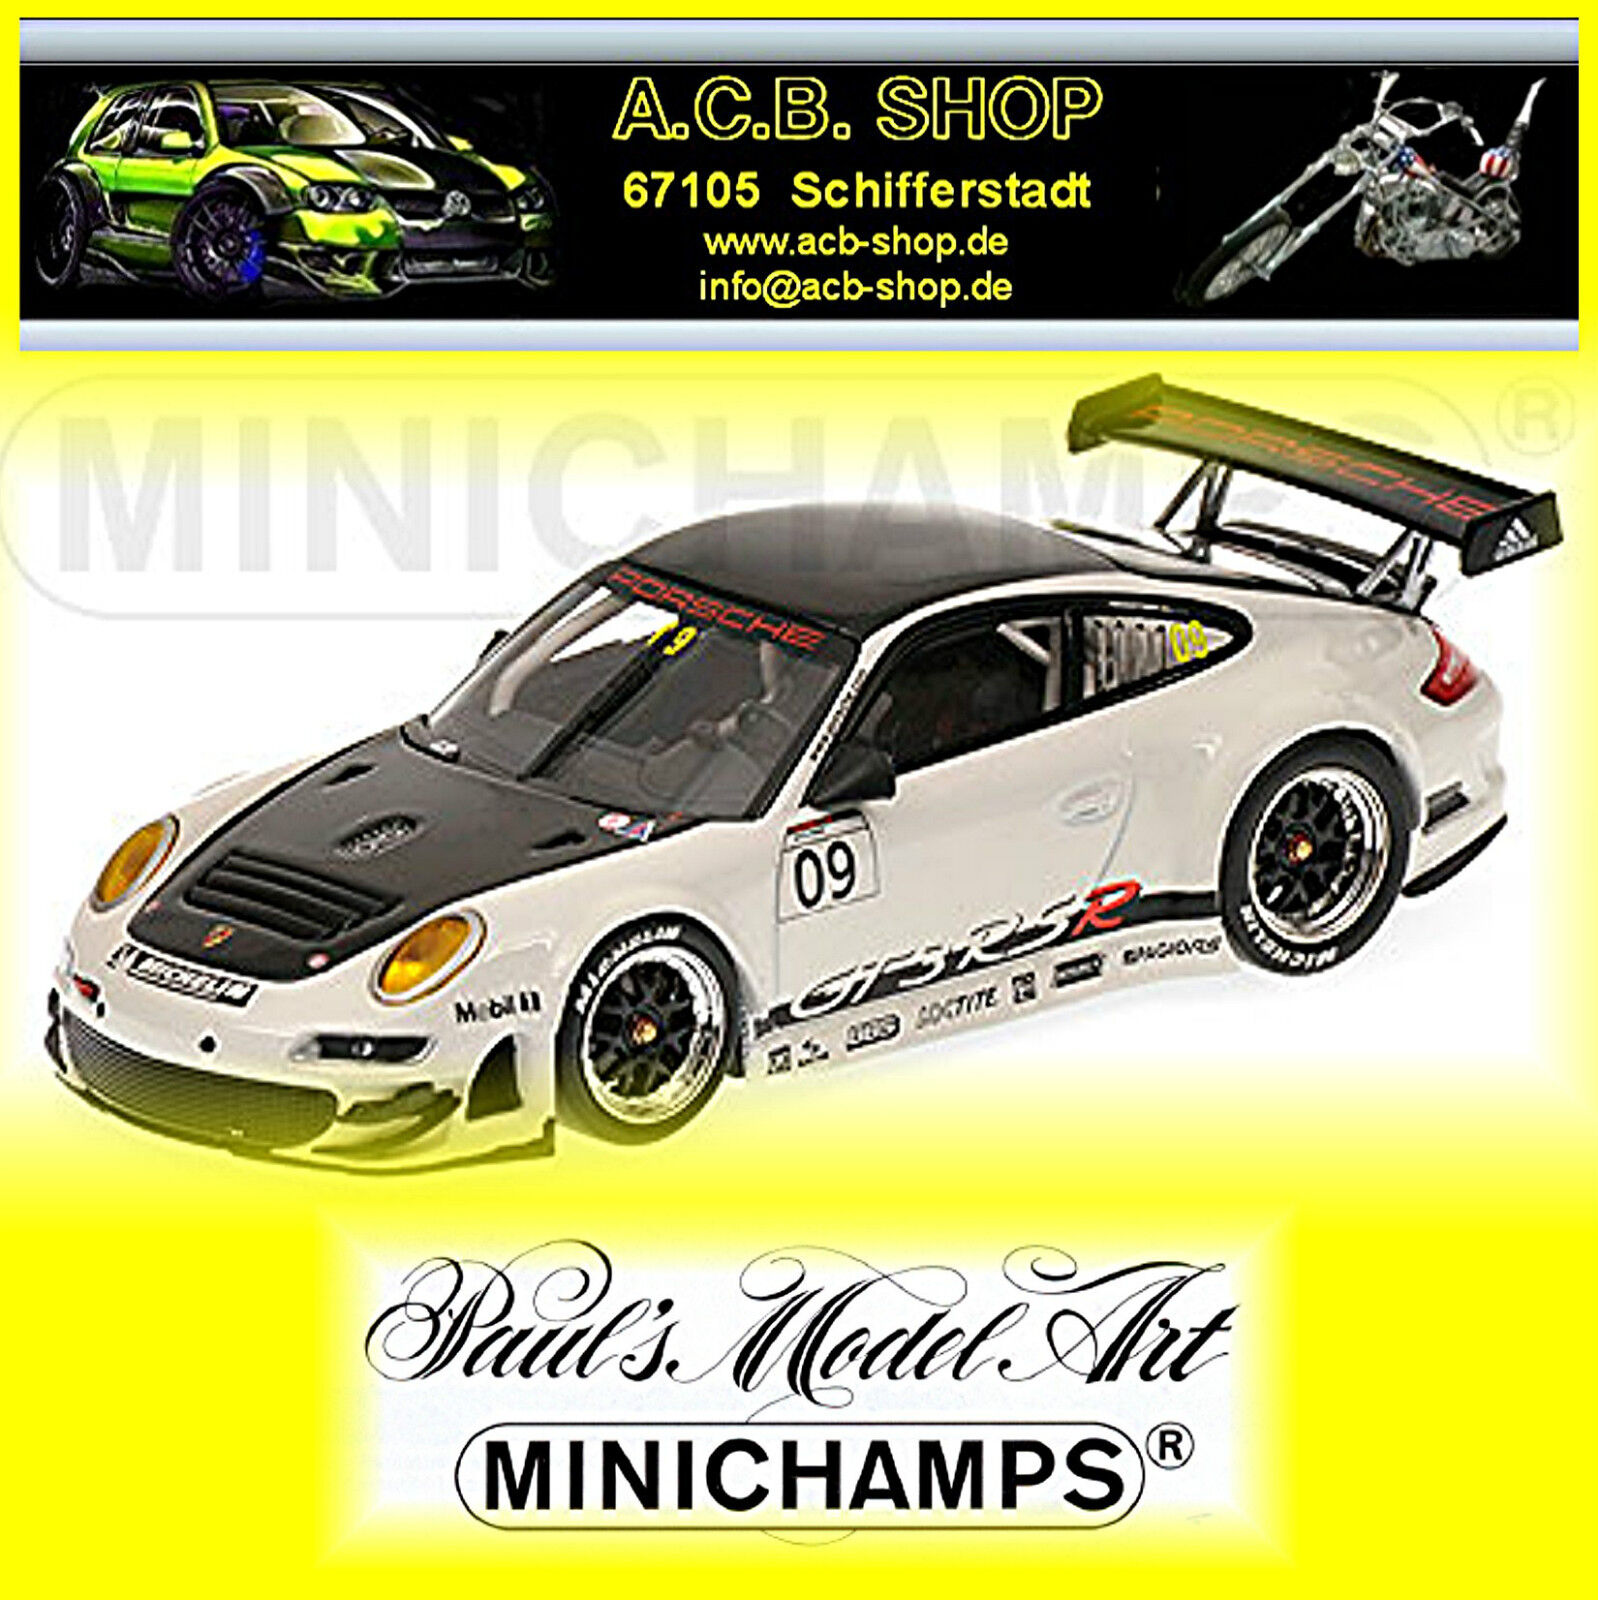 PORSCHE 911 997 gt3 RSR Presentation 2009  09 1 43 Minichamps